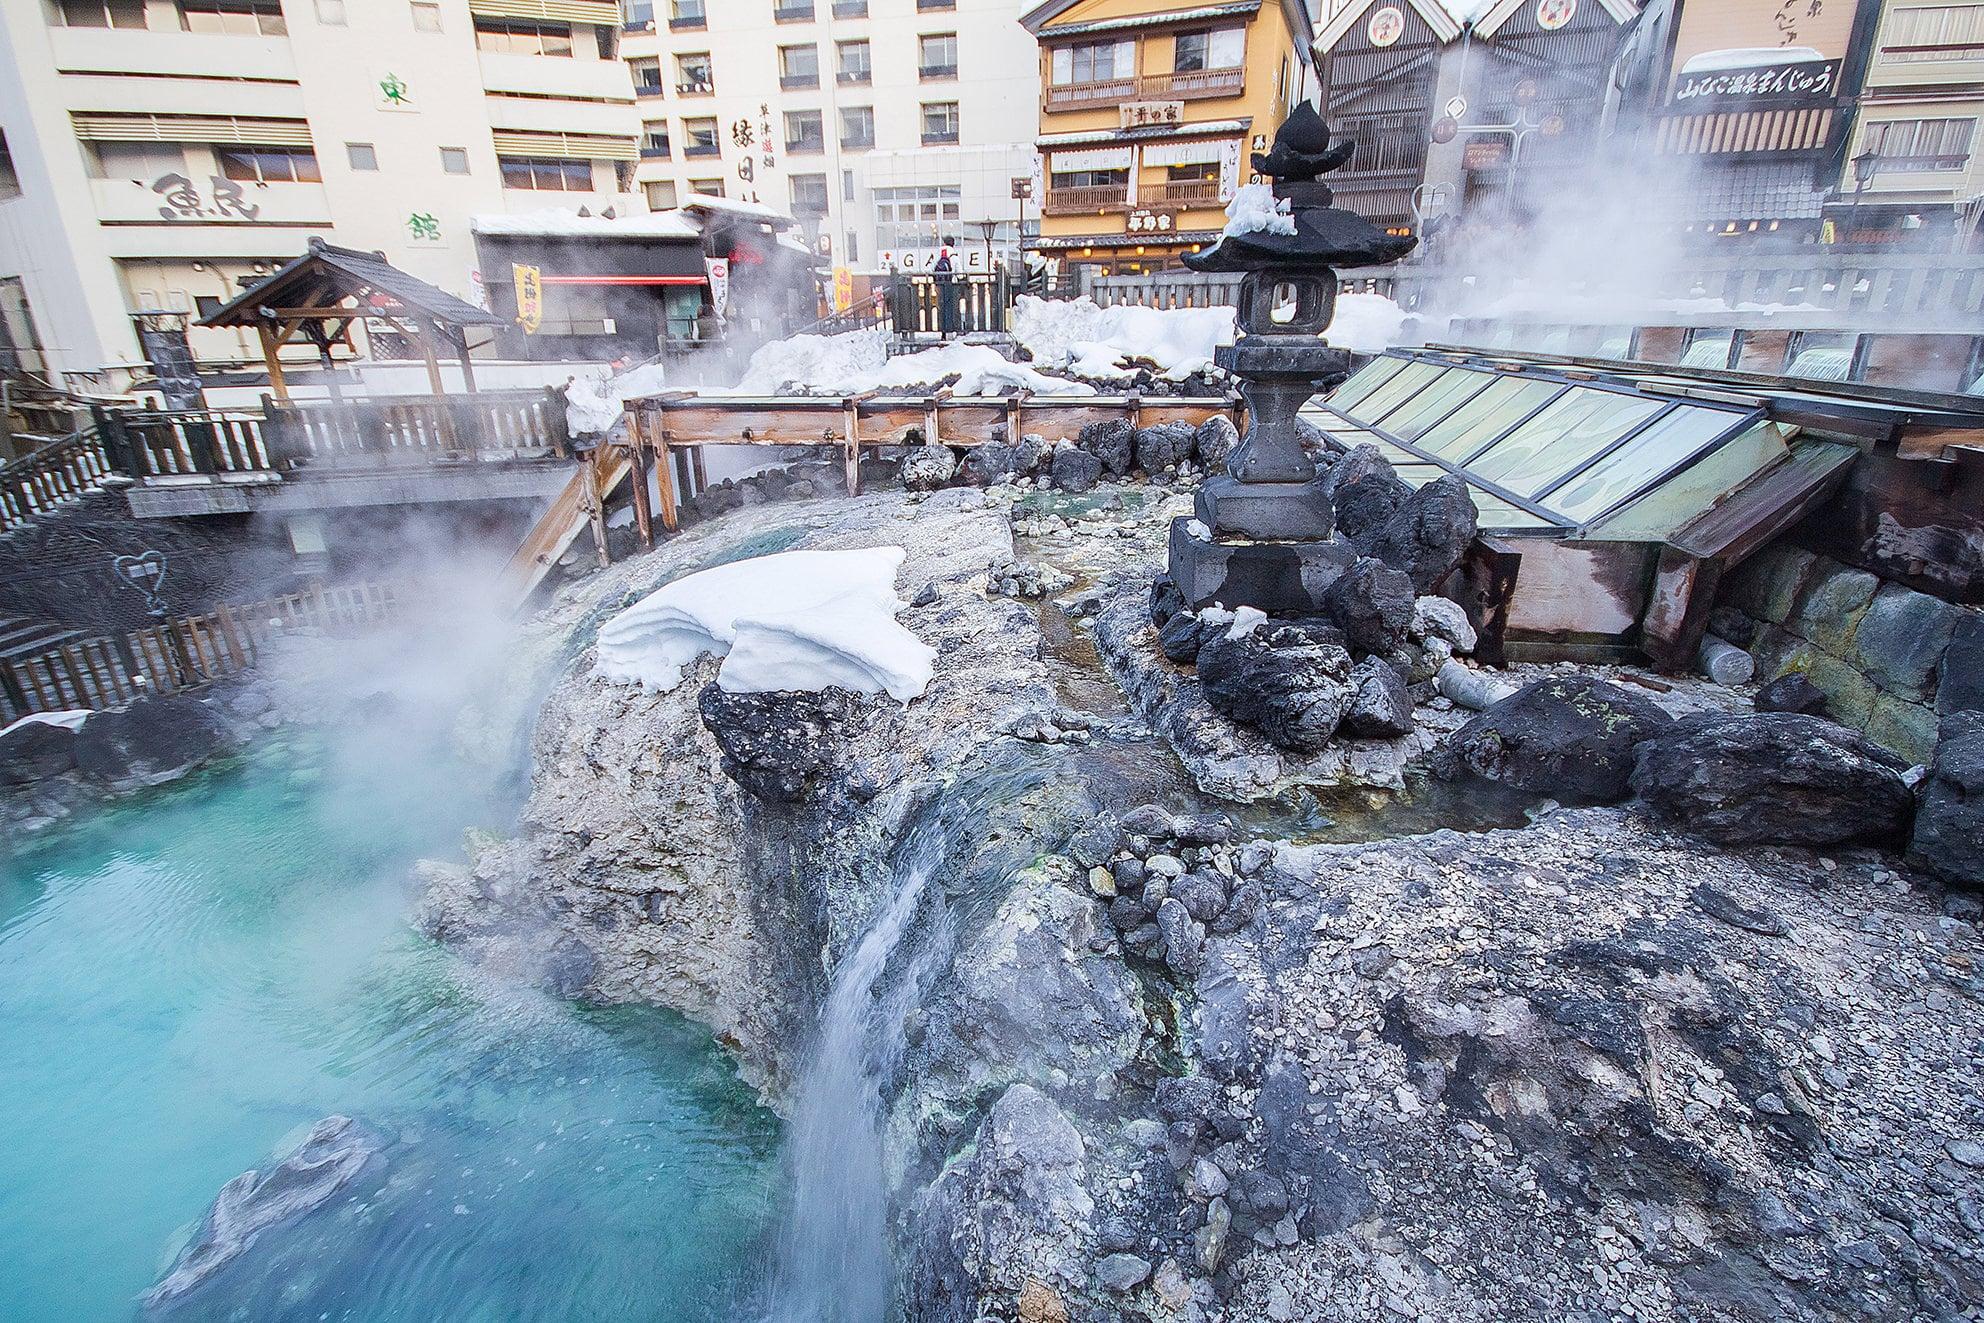 Kusatsu Onsen เที่ยวออนเซ็นเก่าแก่ที่มีชื่อเสียงที่สุดในญี่ปุ่น